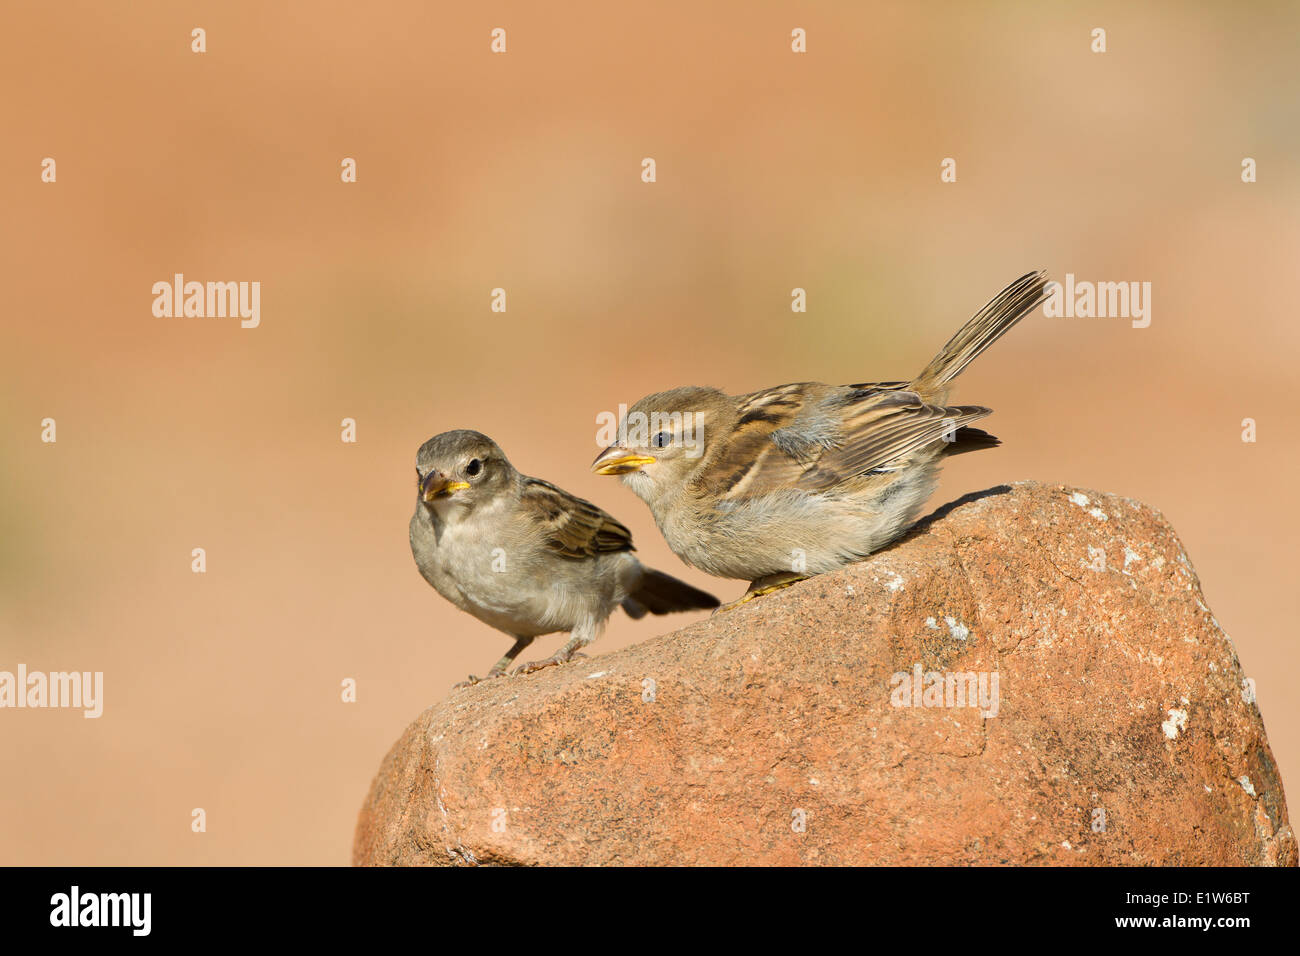 House sparrow (Passer domesticus), fledglings, Elephant Head Pond, Amado, Arizona. - Stock Image